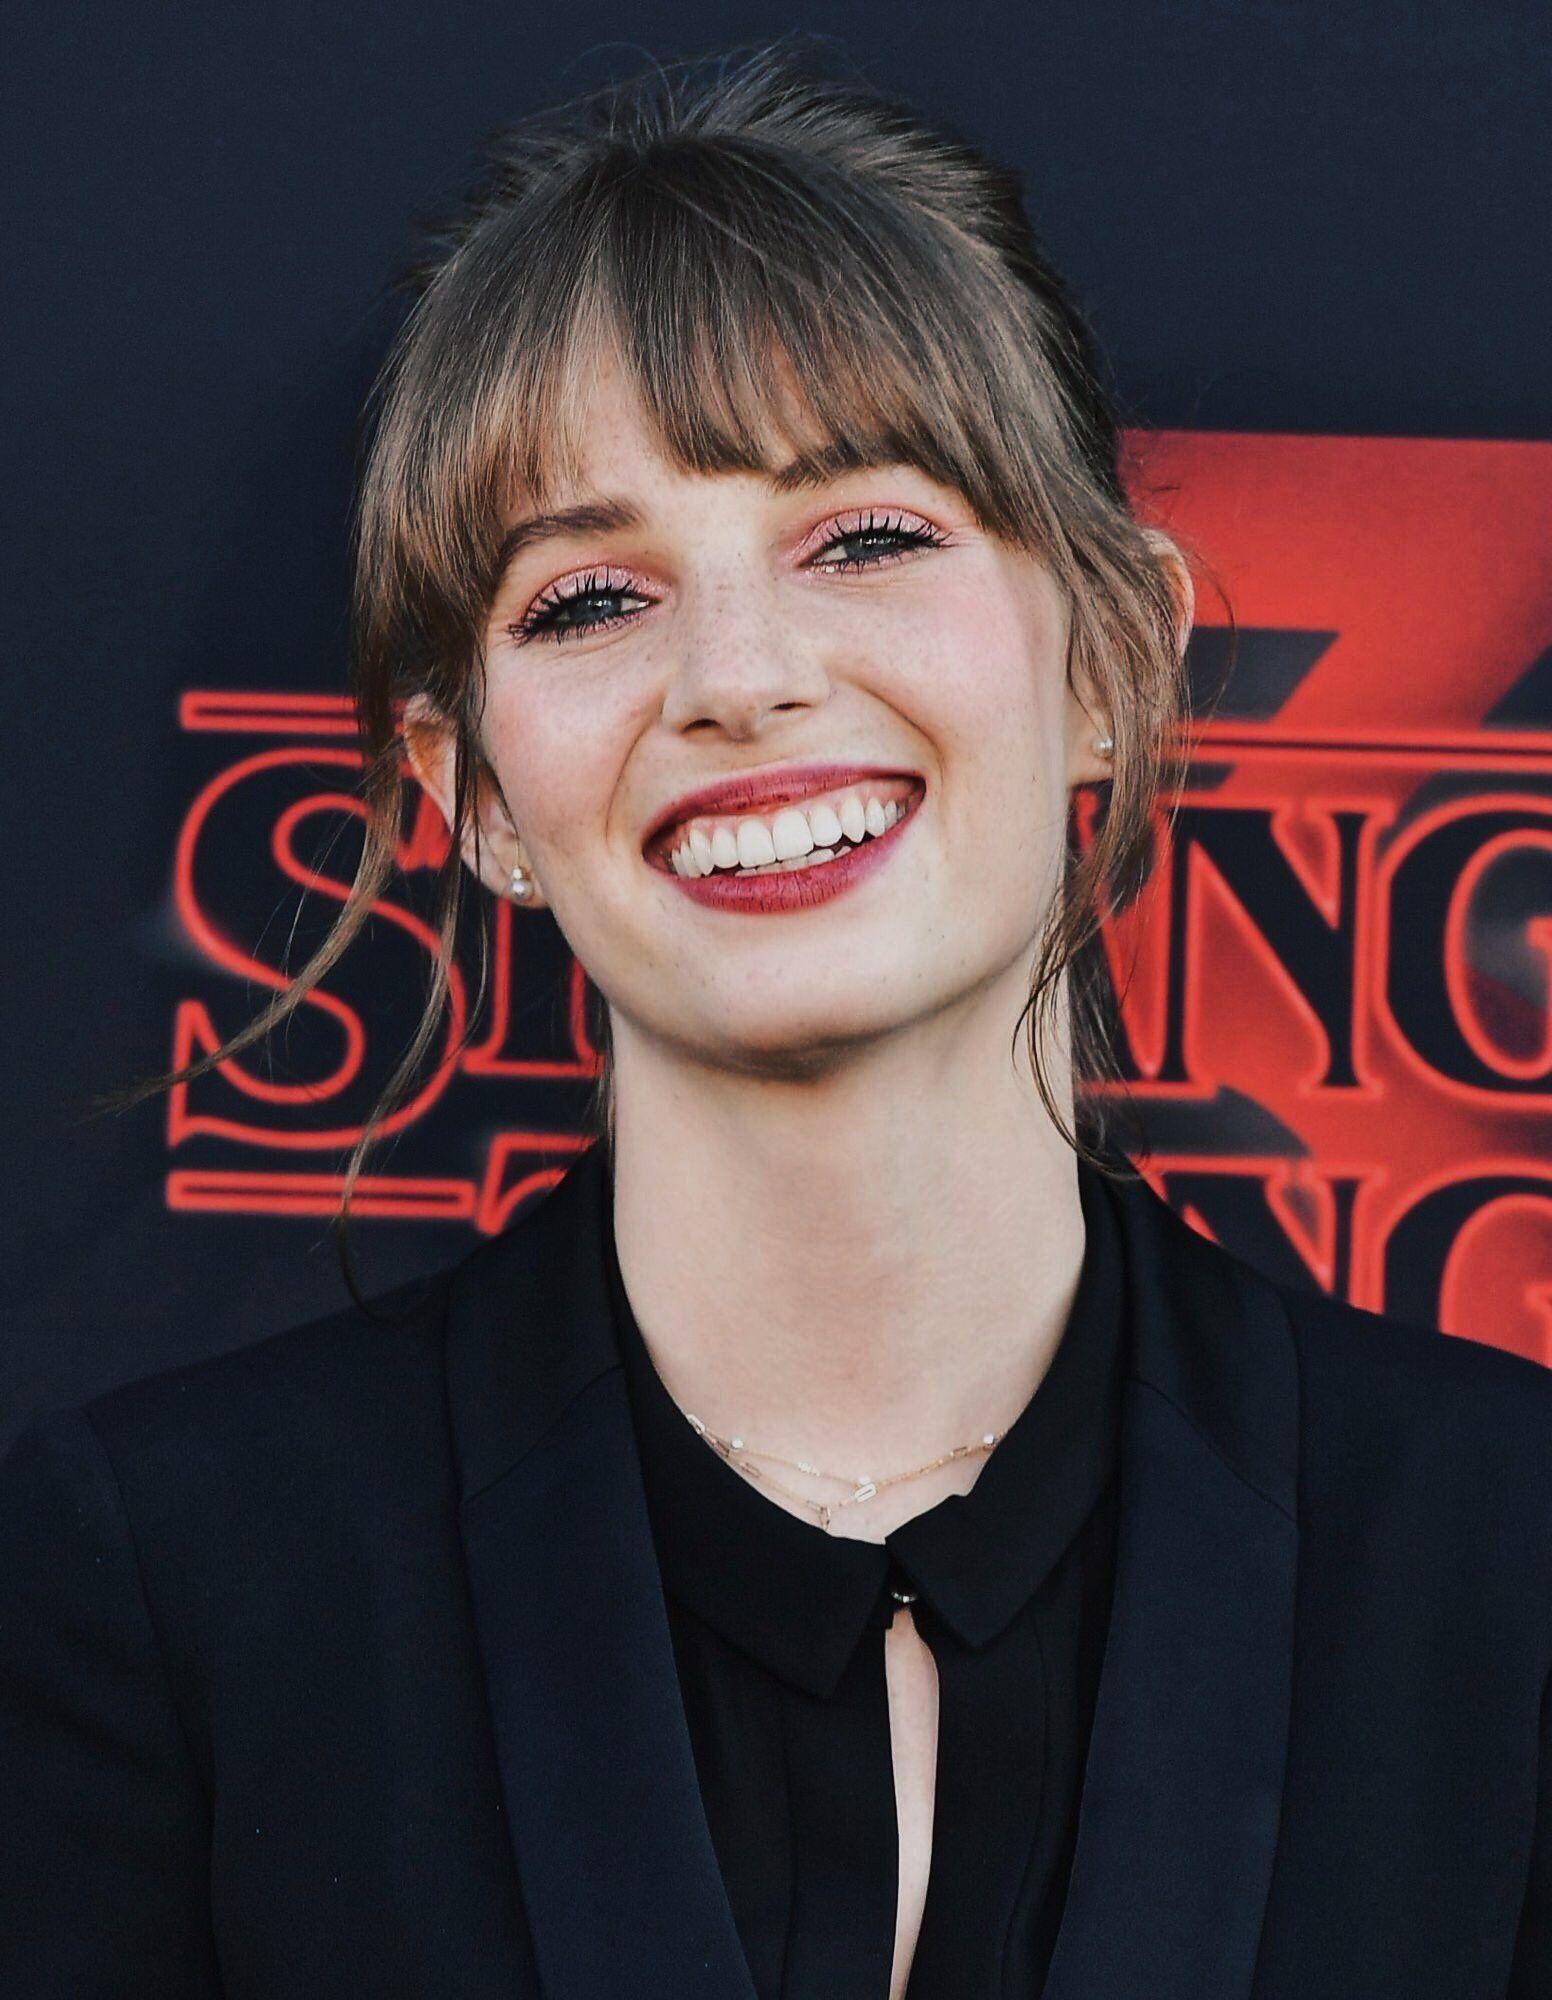 Pin By Alice Green On Stranger Things In 2019 Cast Stranger